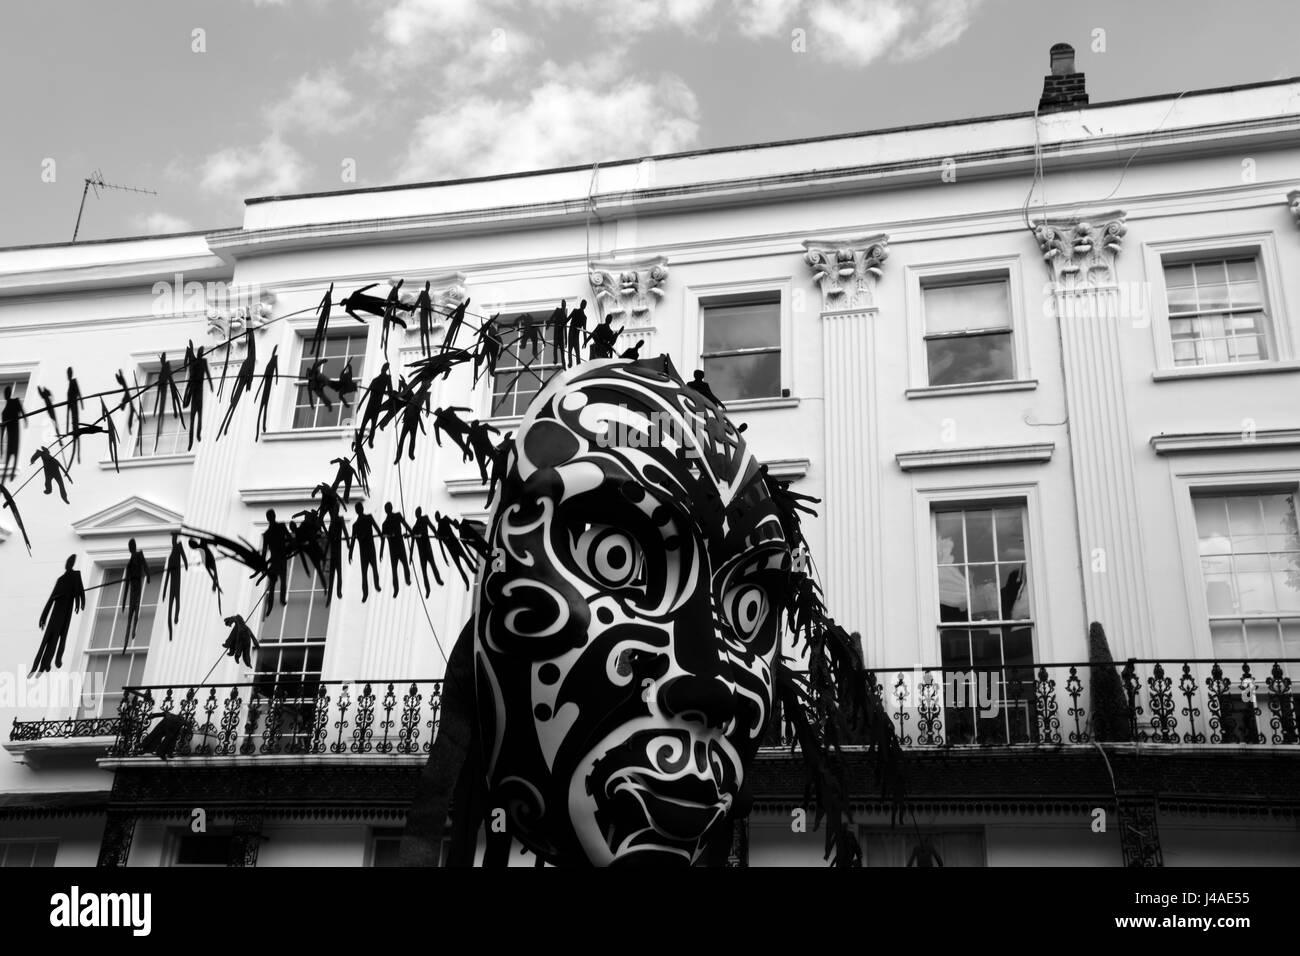 Main fesitval parade for the Notting Hill Carnival, London, UK - Stock Image